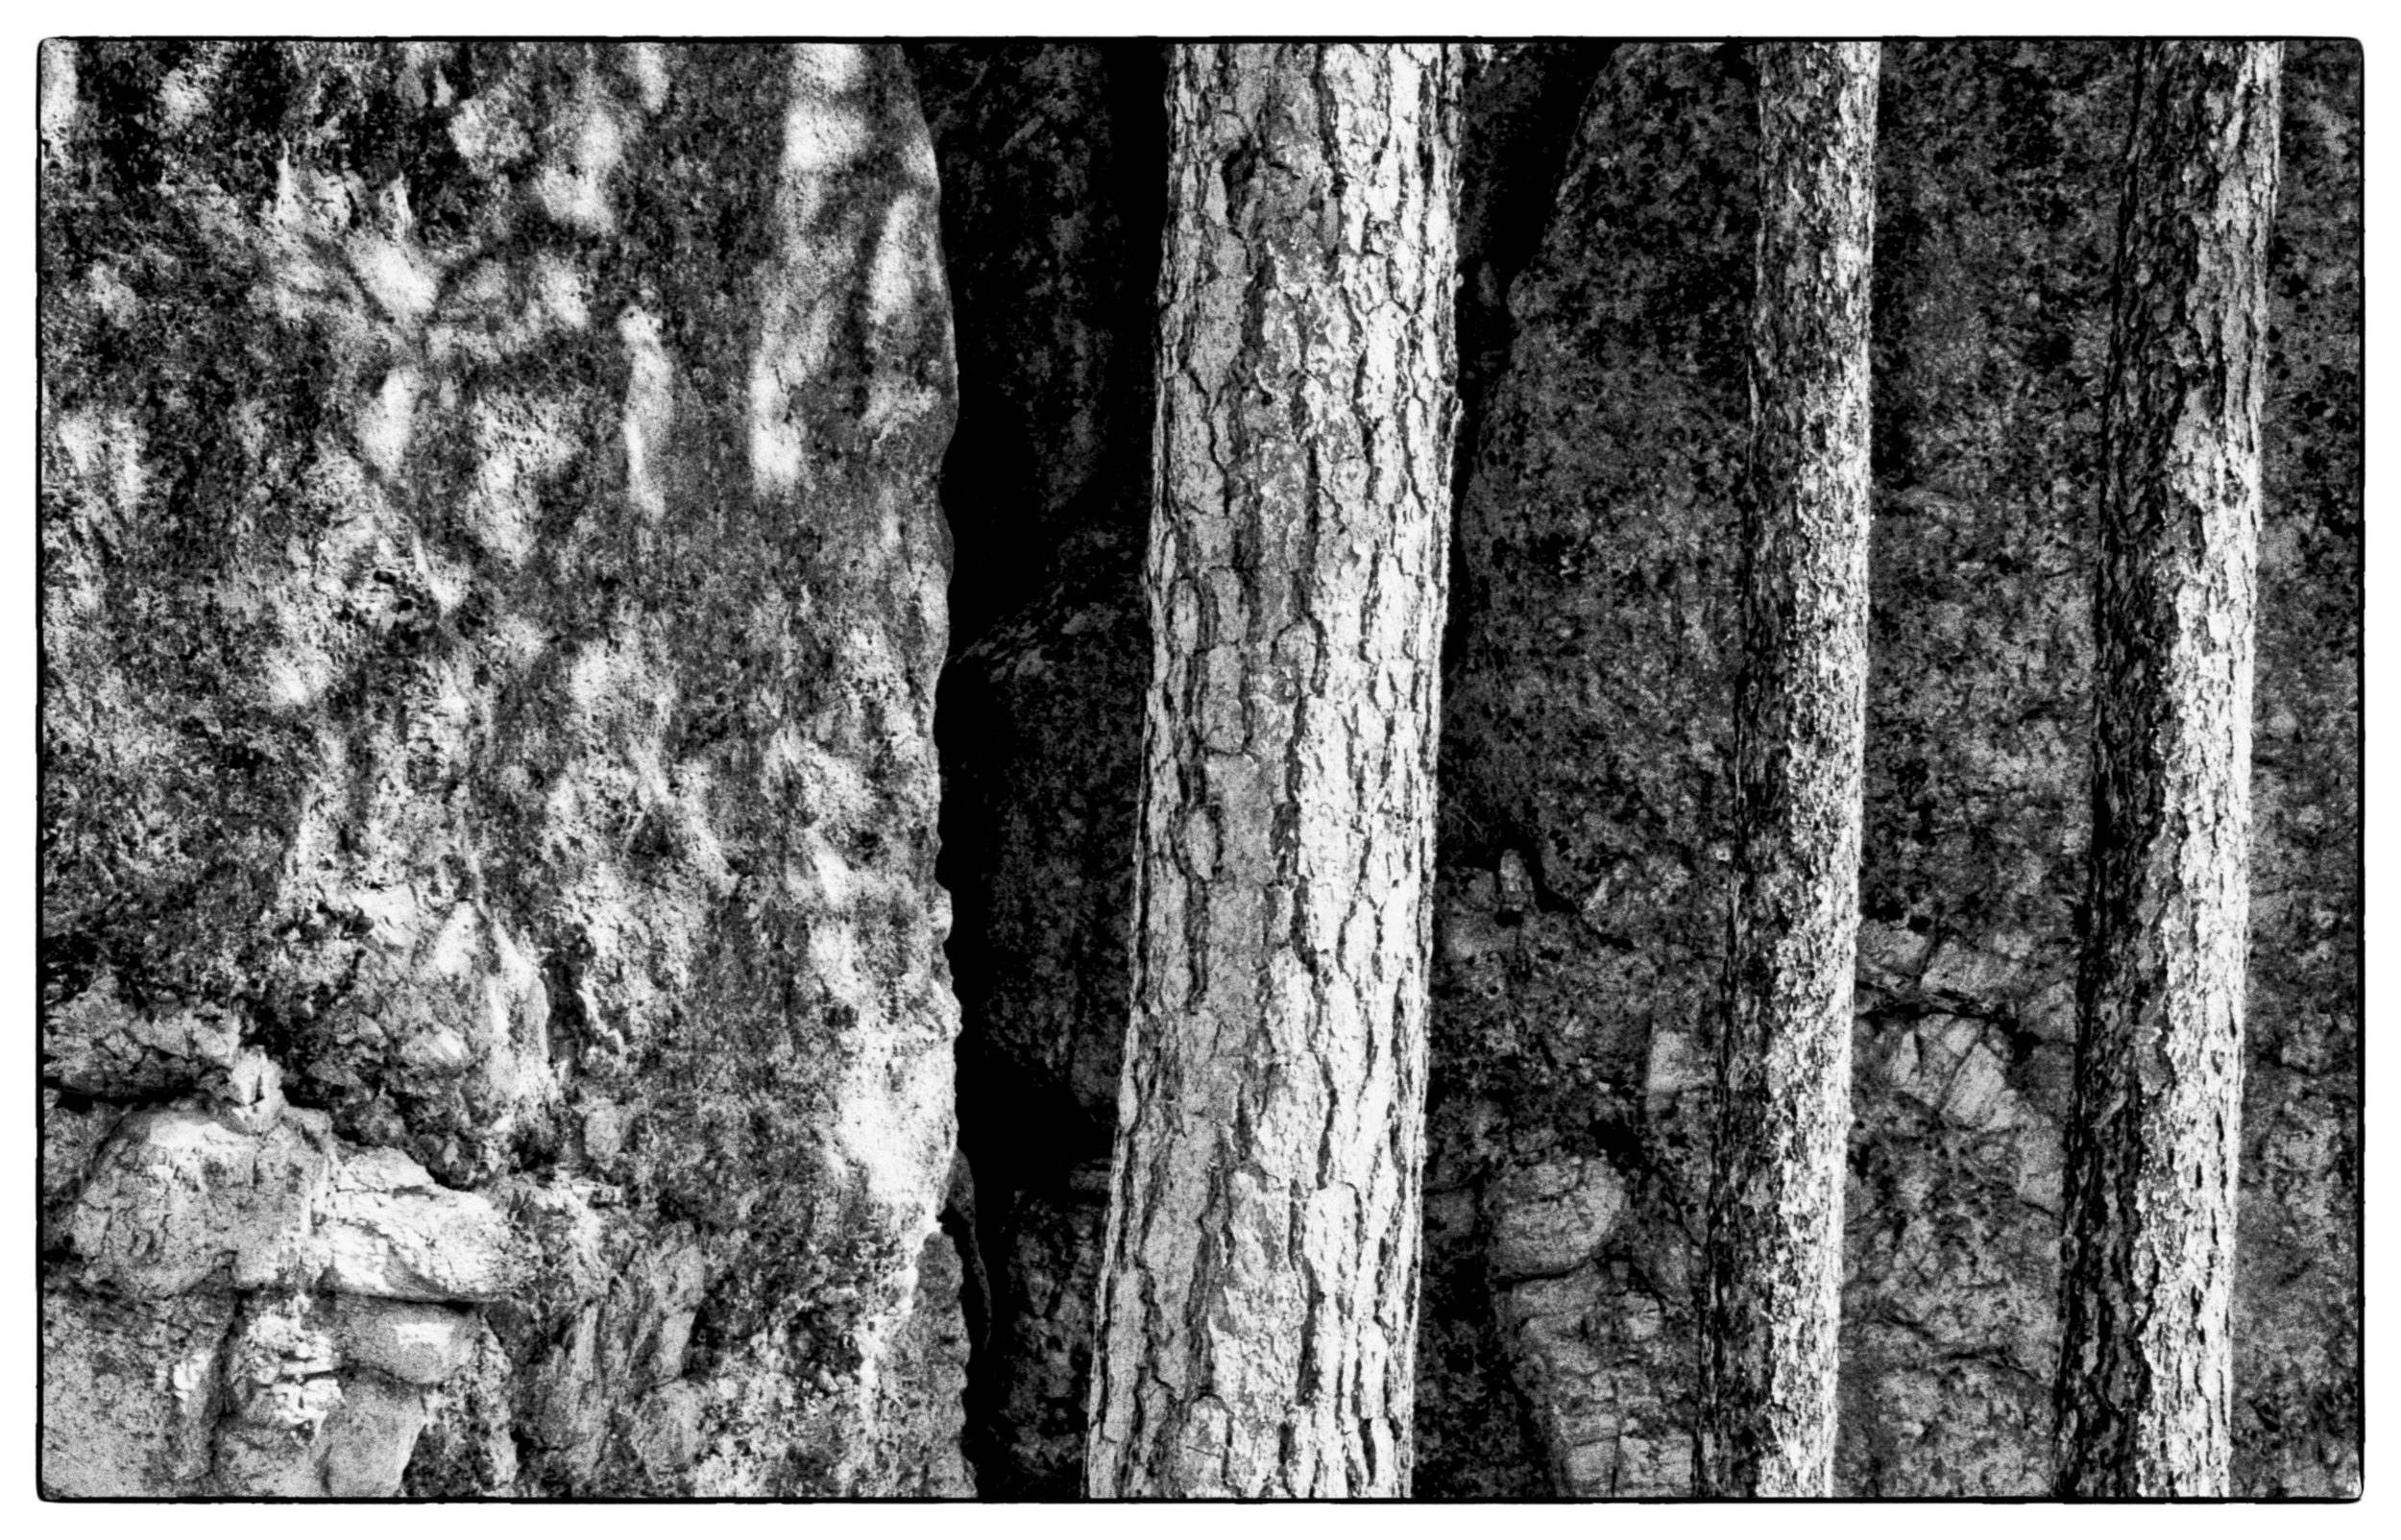 Trees near Mr. Rushmore